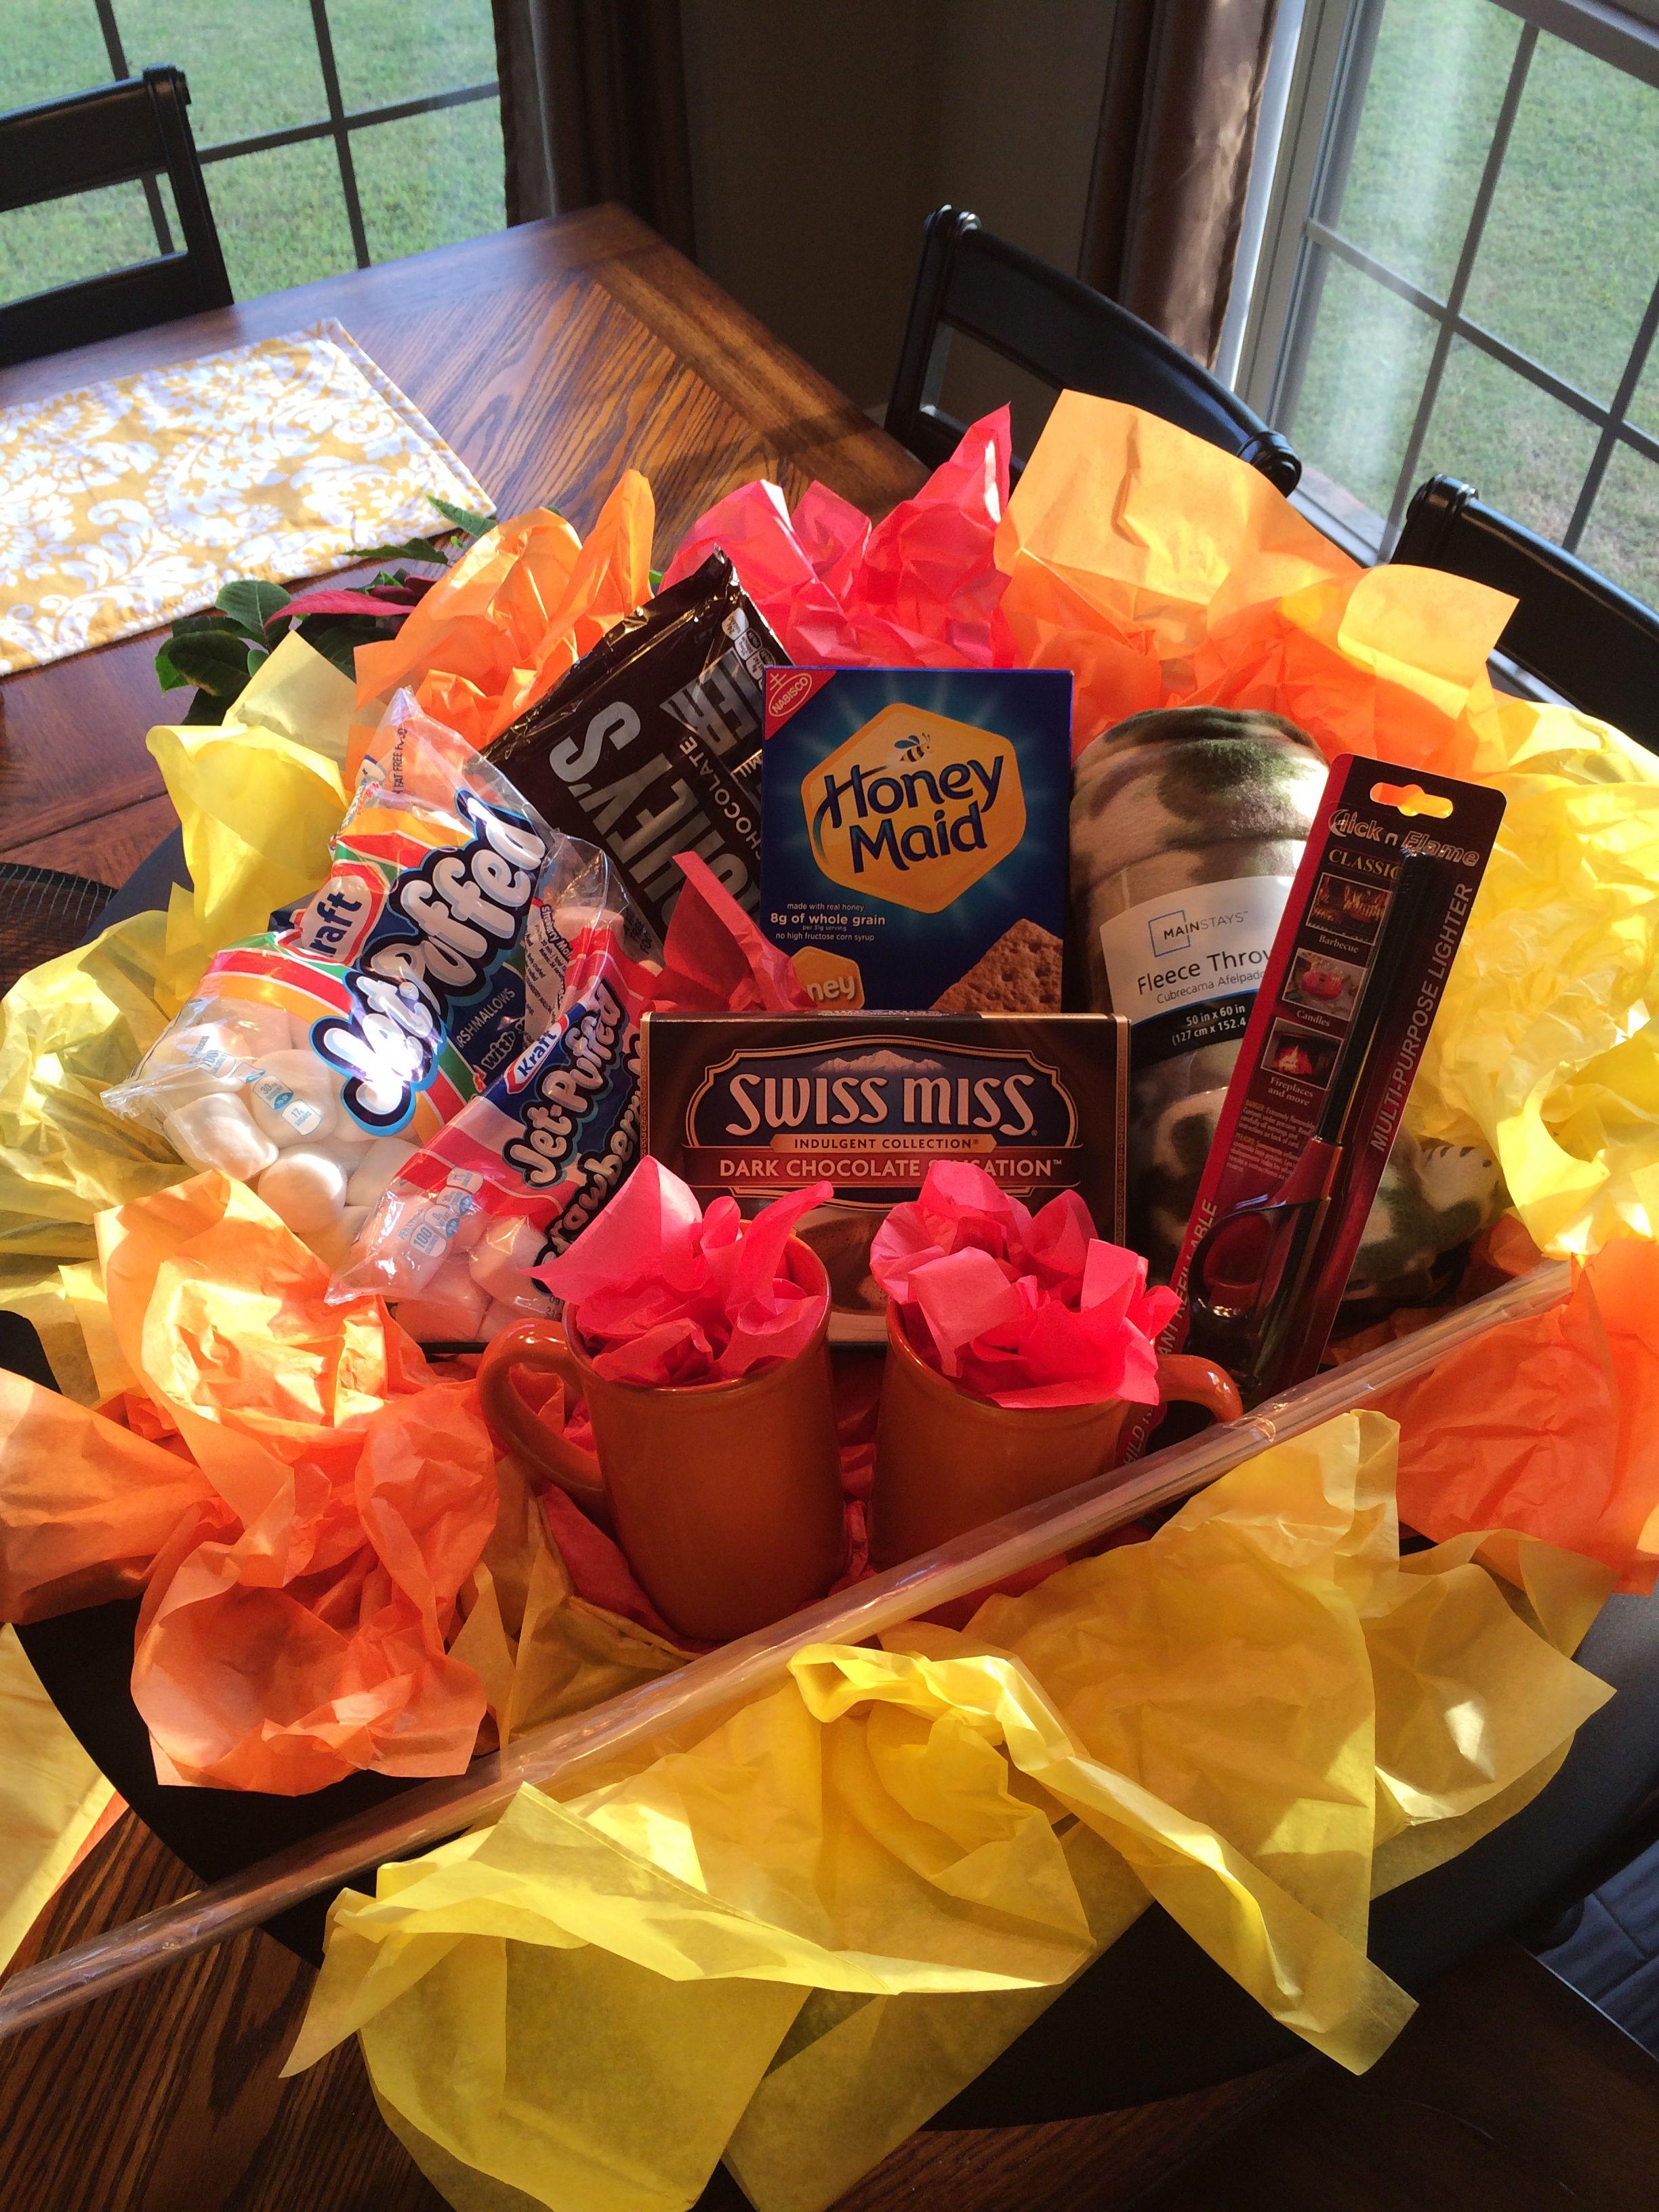 Fire Pit Backyard Bonfire Gift Basket Good For A Silent Auction Or Fundraiser